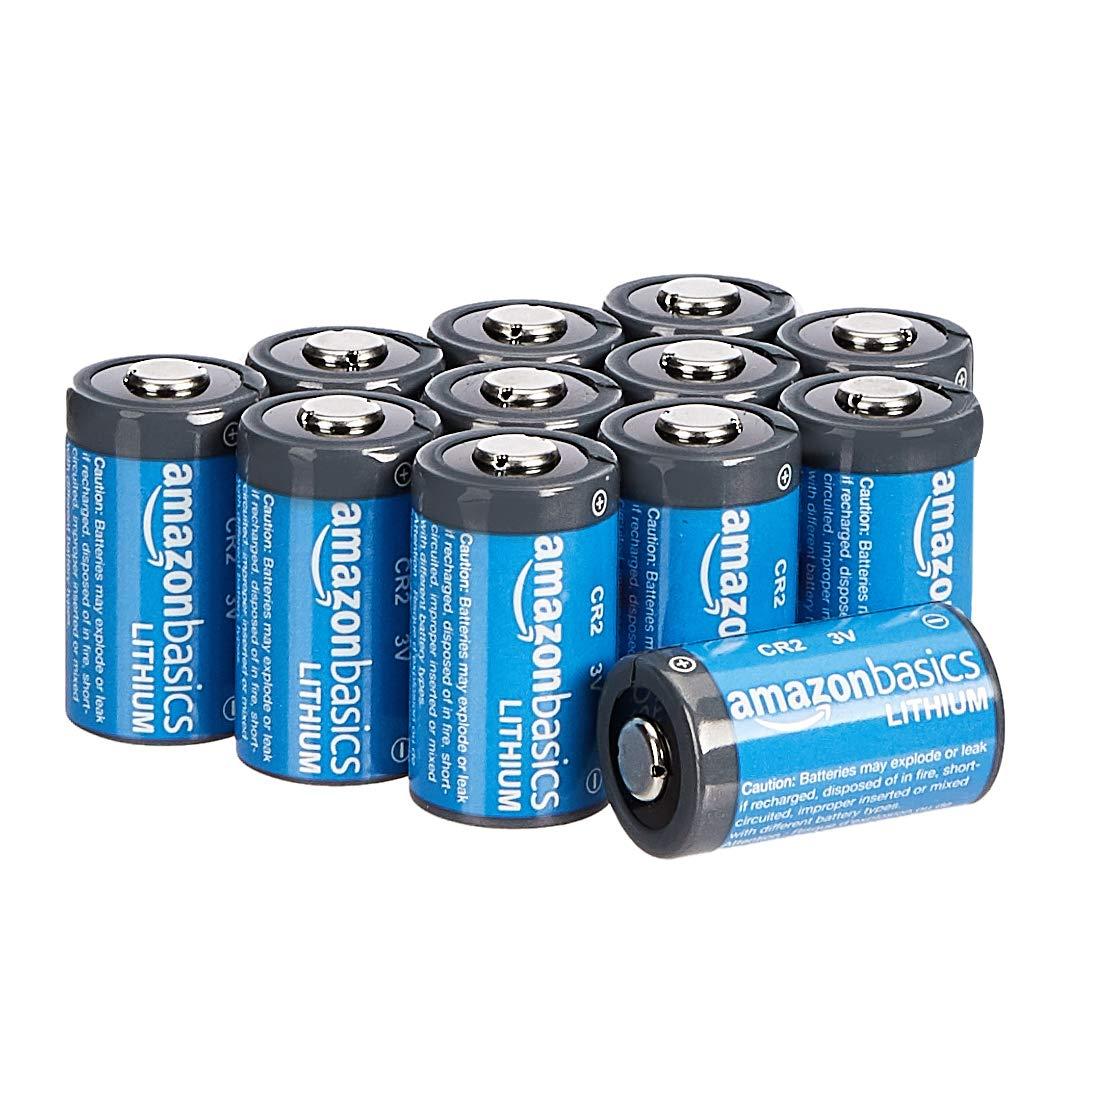 AmazonBasics Lithium CR2 3 Volt Batteries - Pack of 12